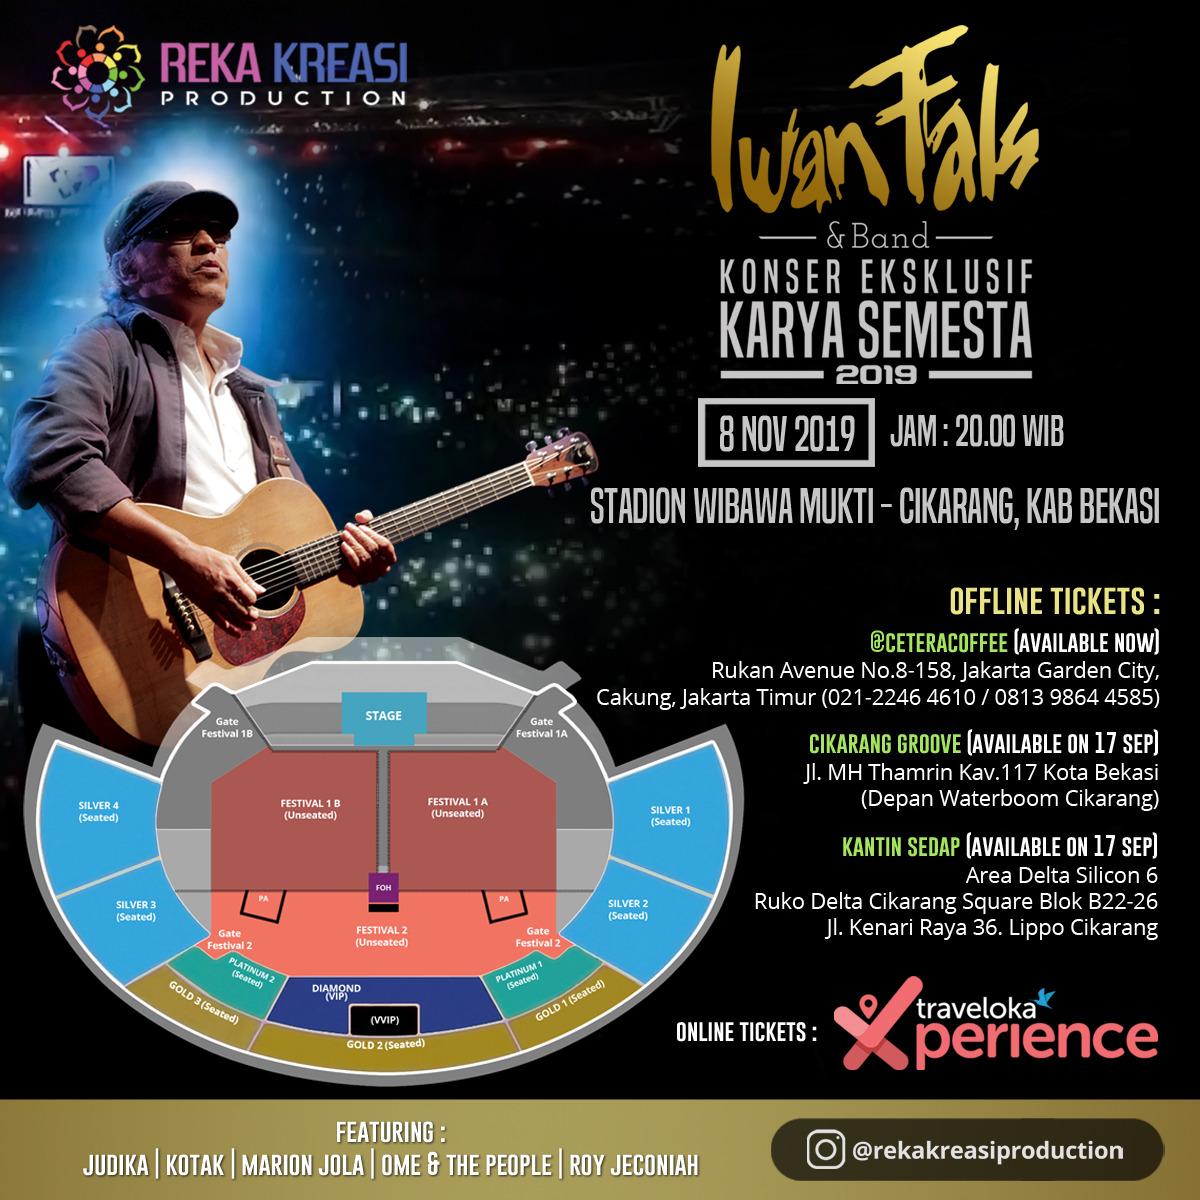 Konser Iwan Fals Cikarang: Ini Harga Tiketnya